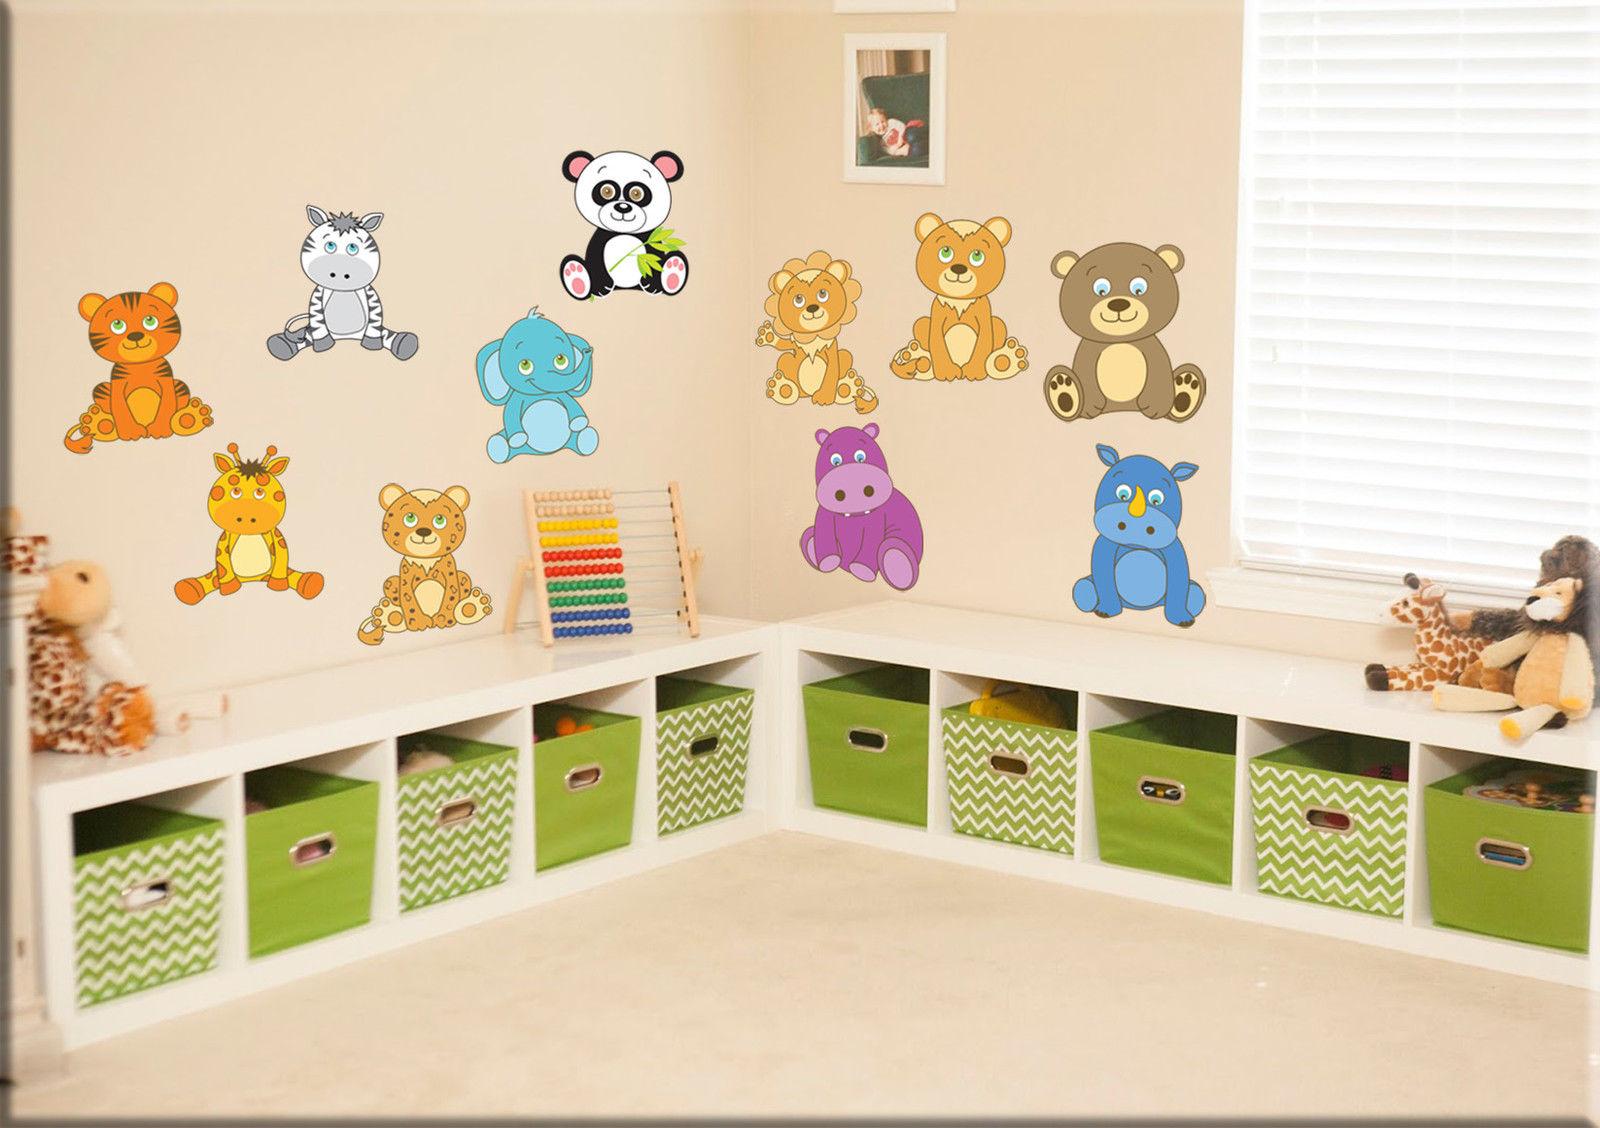 Arredi murali adesivi murali quadri moderni - Adesivi per mobili bambini ...